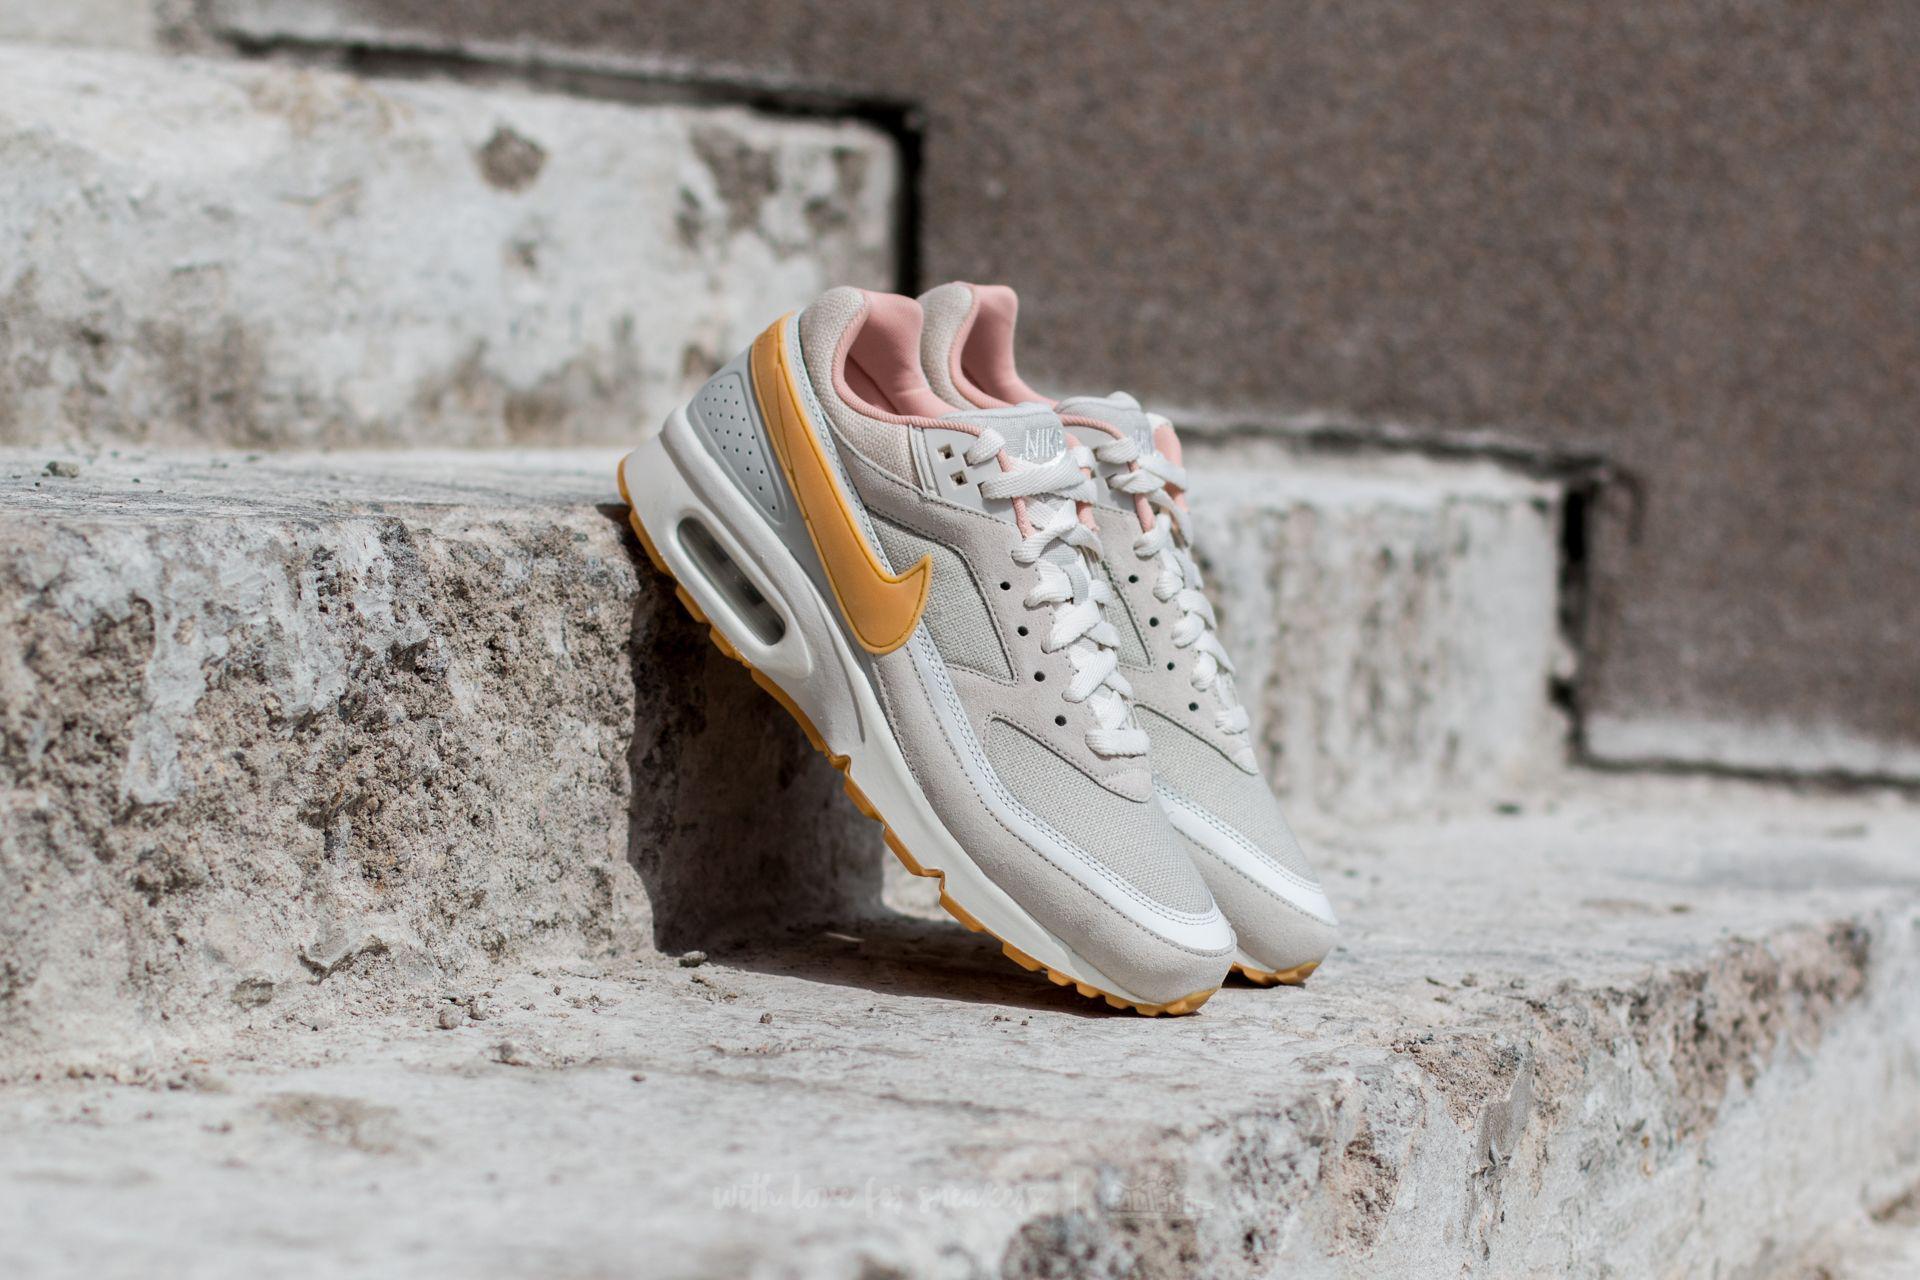 91f78394dd Nike Air Max Bw Premium Phantom/ Gum Yellow-light Bone in Gray for ...